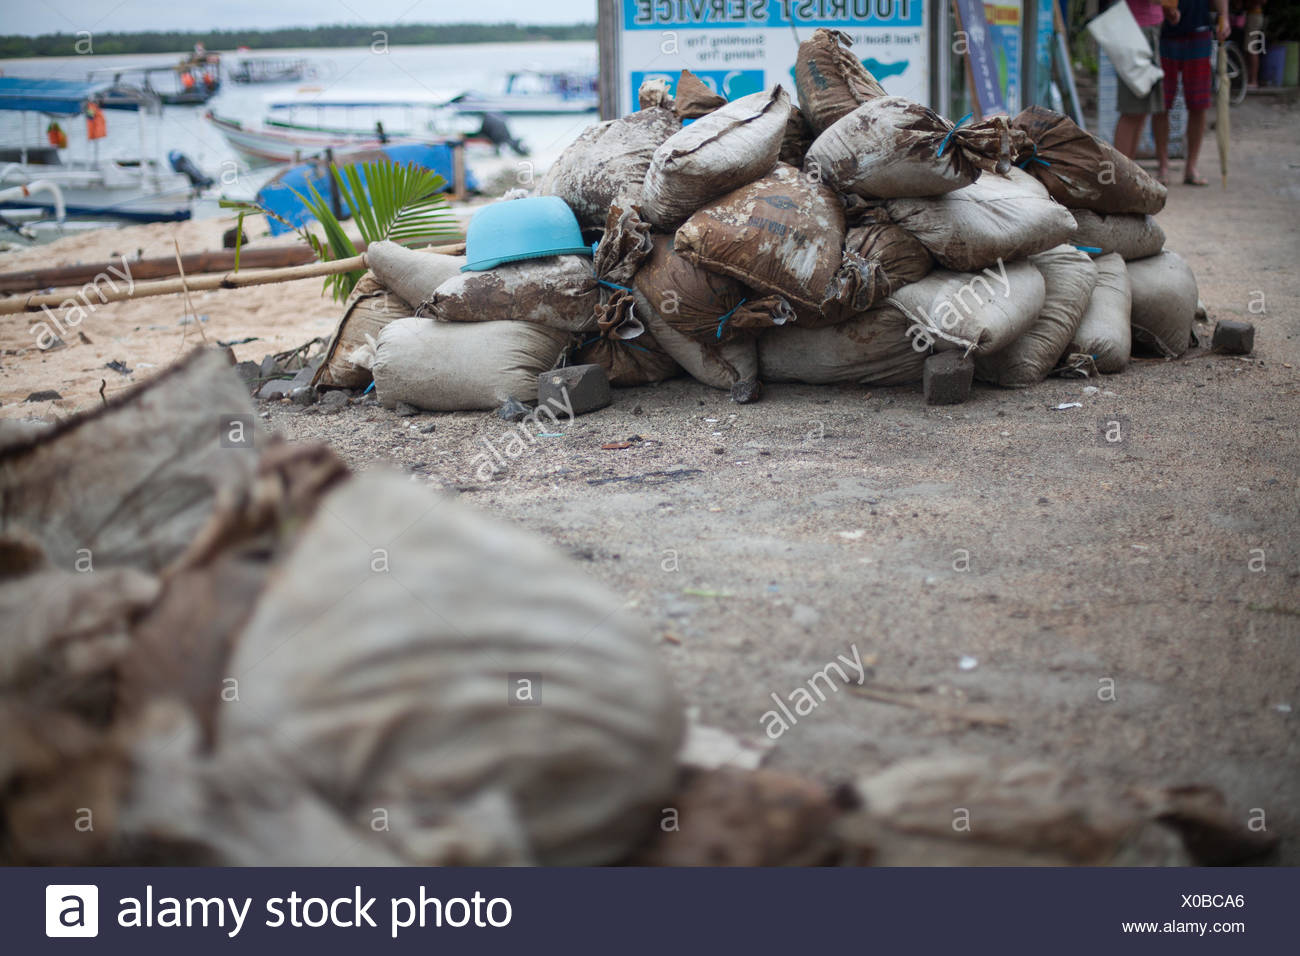 Heap Of Sacks On Sand At Beach - Stock Image